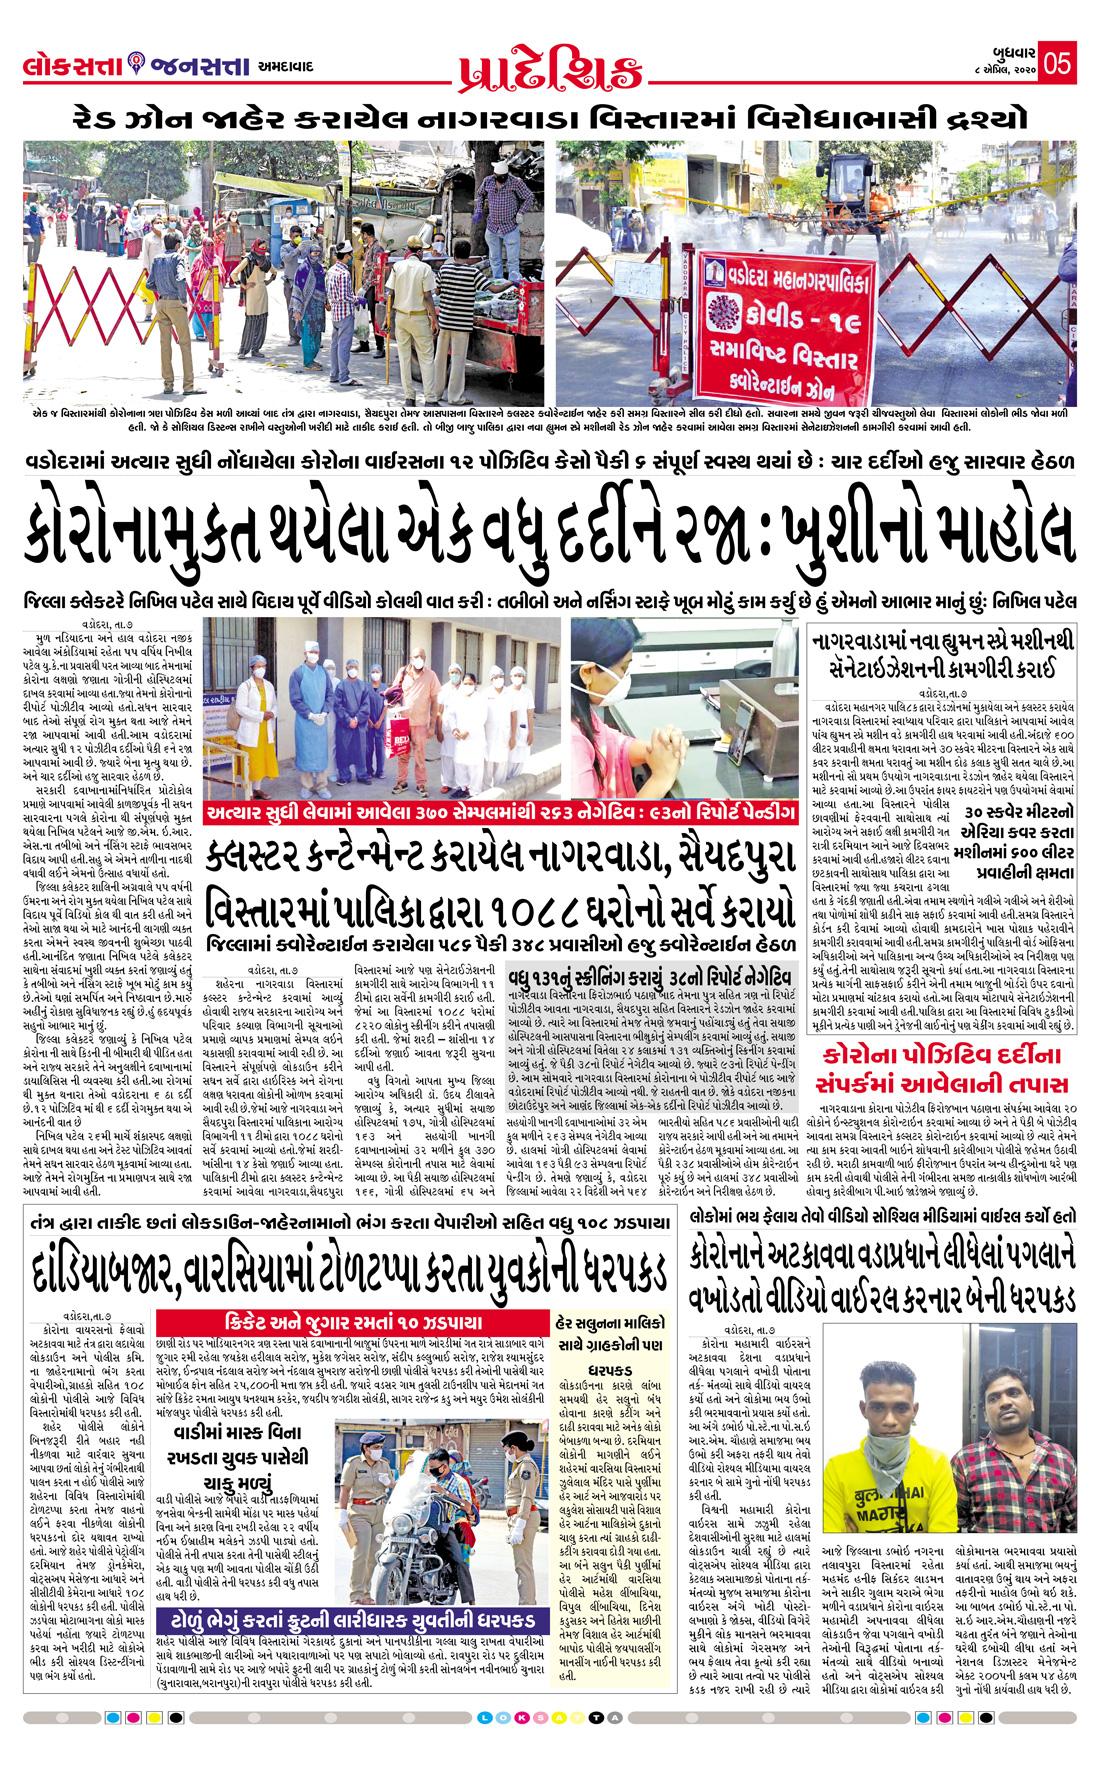 Loksatta Jansatta News Papaer E-paper dated 2020-04-08   Page 5